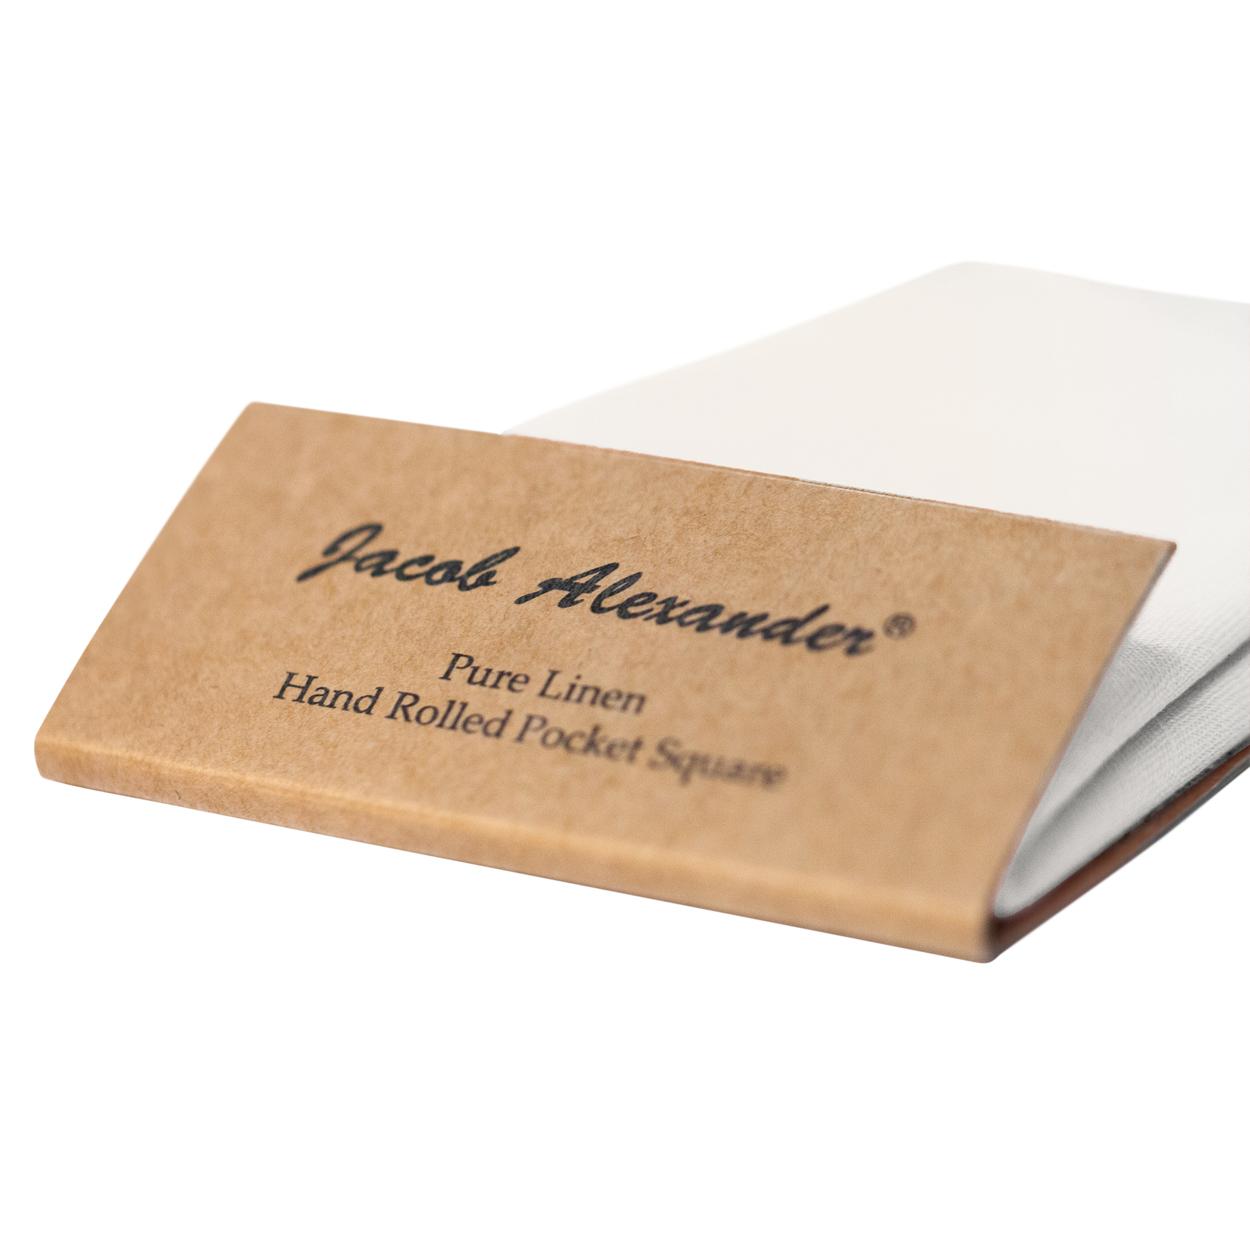 Jacob-Alexander-Linen-Handrolled-15-034-x-15-034-Pocket-Square-Hanky thumbnail 40